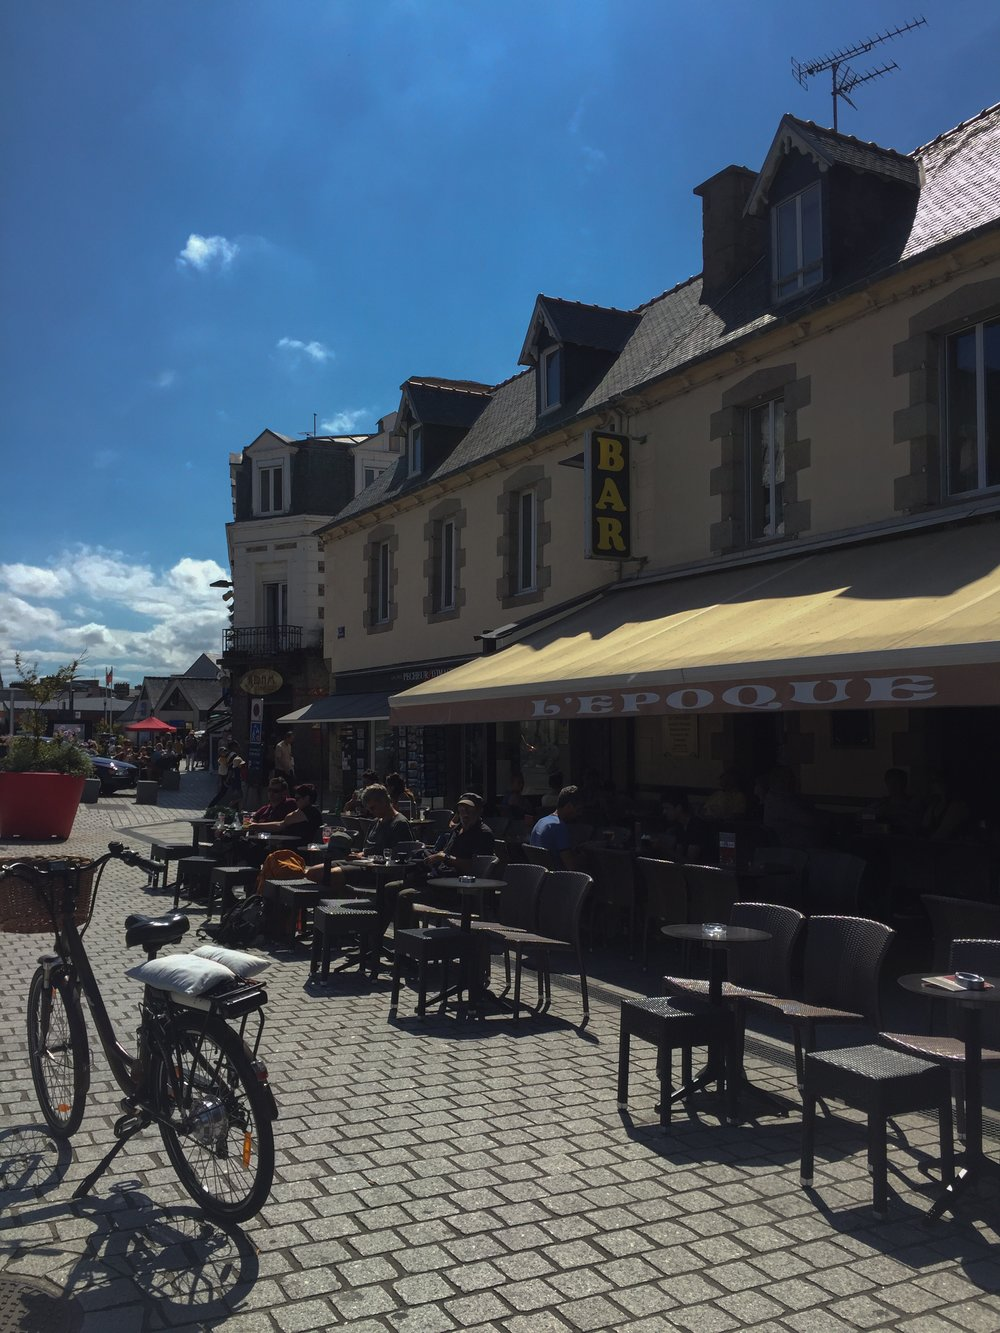 cafe side of main street